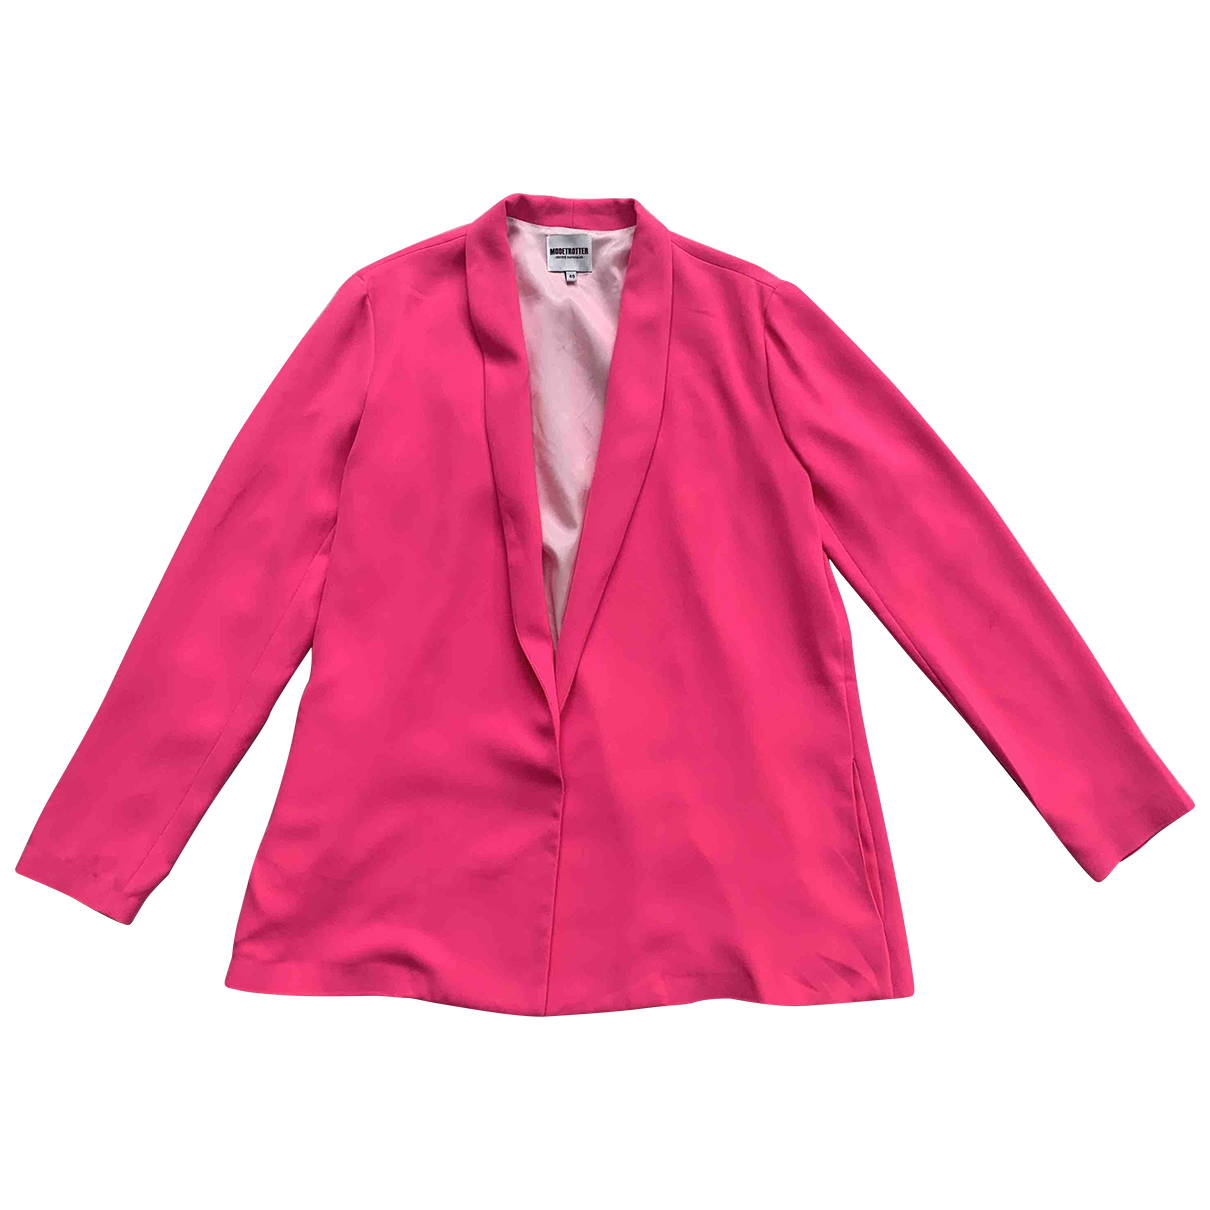 Modetrotter \N Jacke in  Rosa Polyester